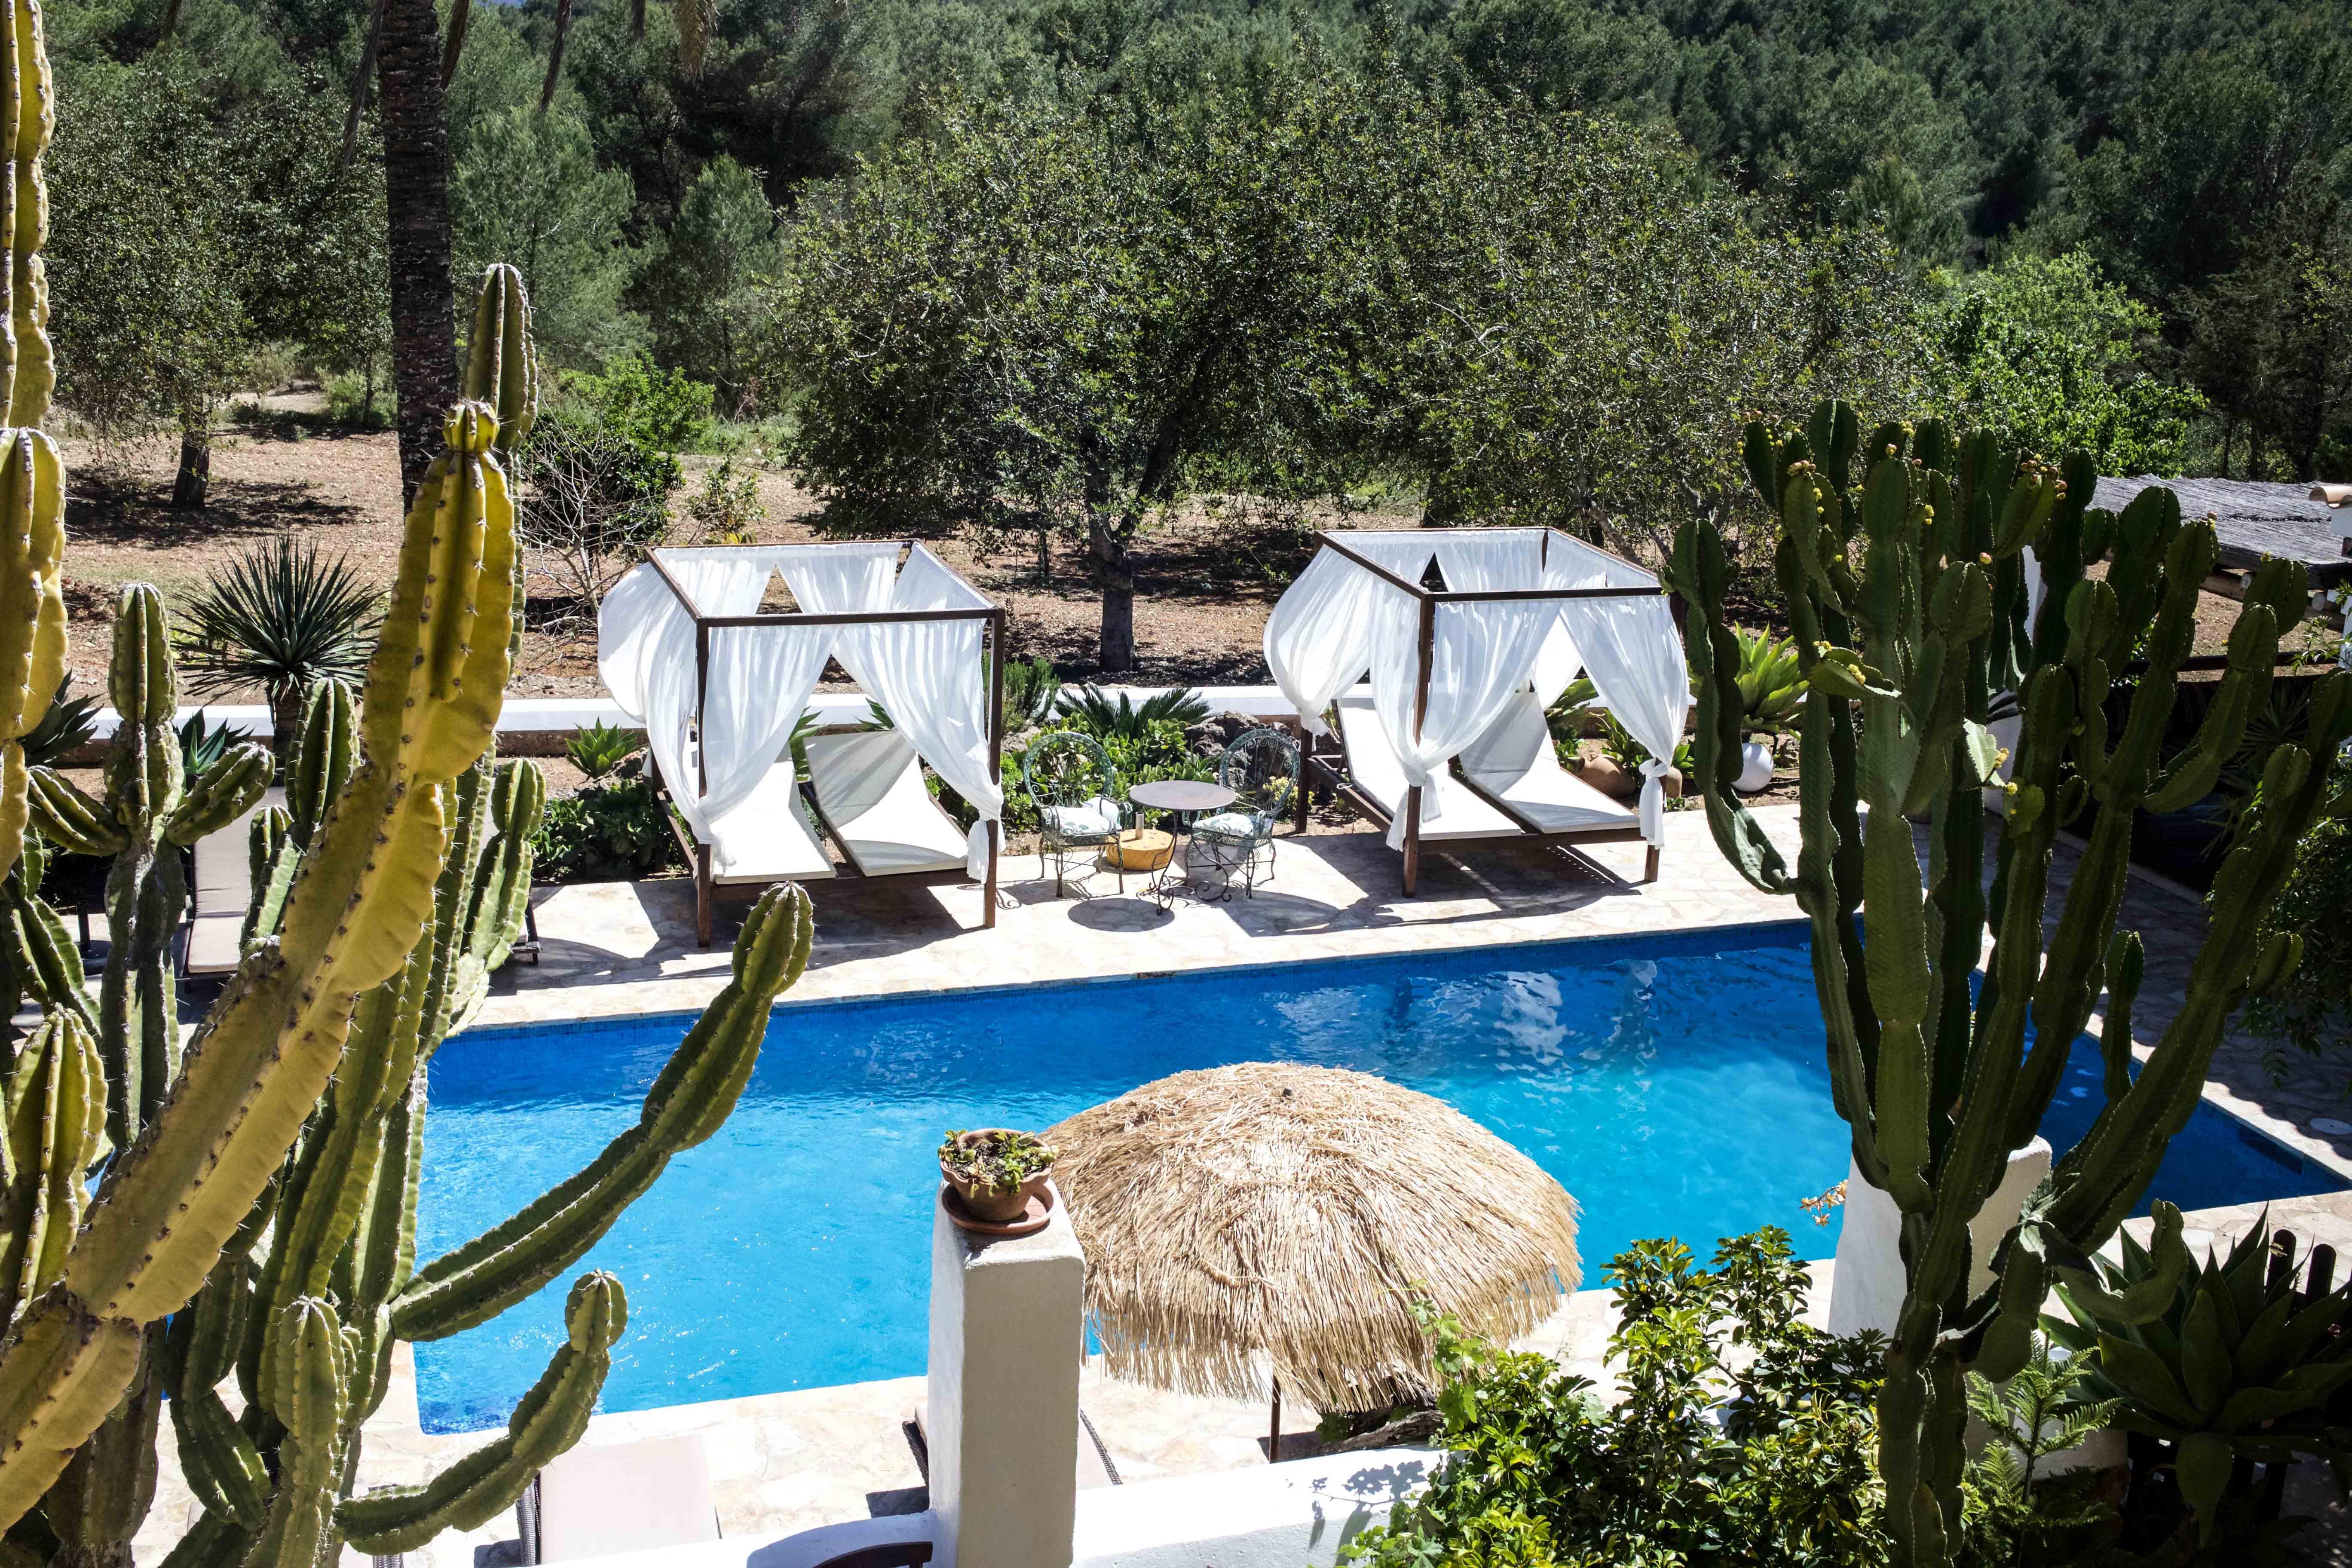 travelblog-reiseblog-ibiza-kurztrip-mädelstrip-luxus-villa_9185